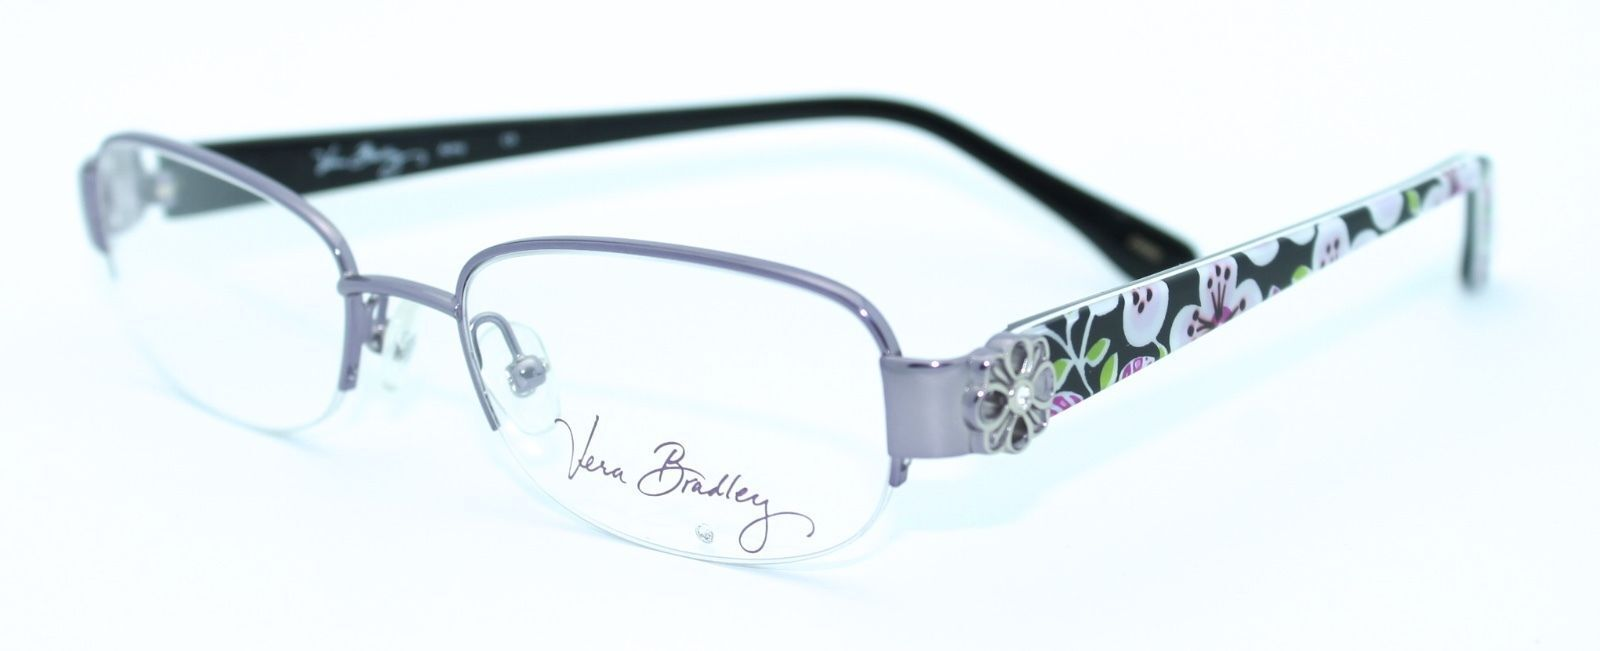 best place for eyeglasses for bofi mena